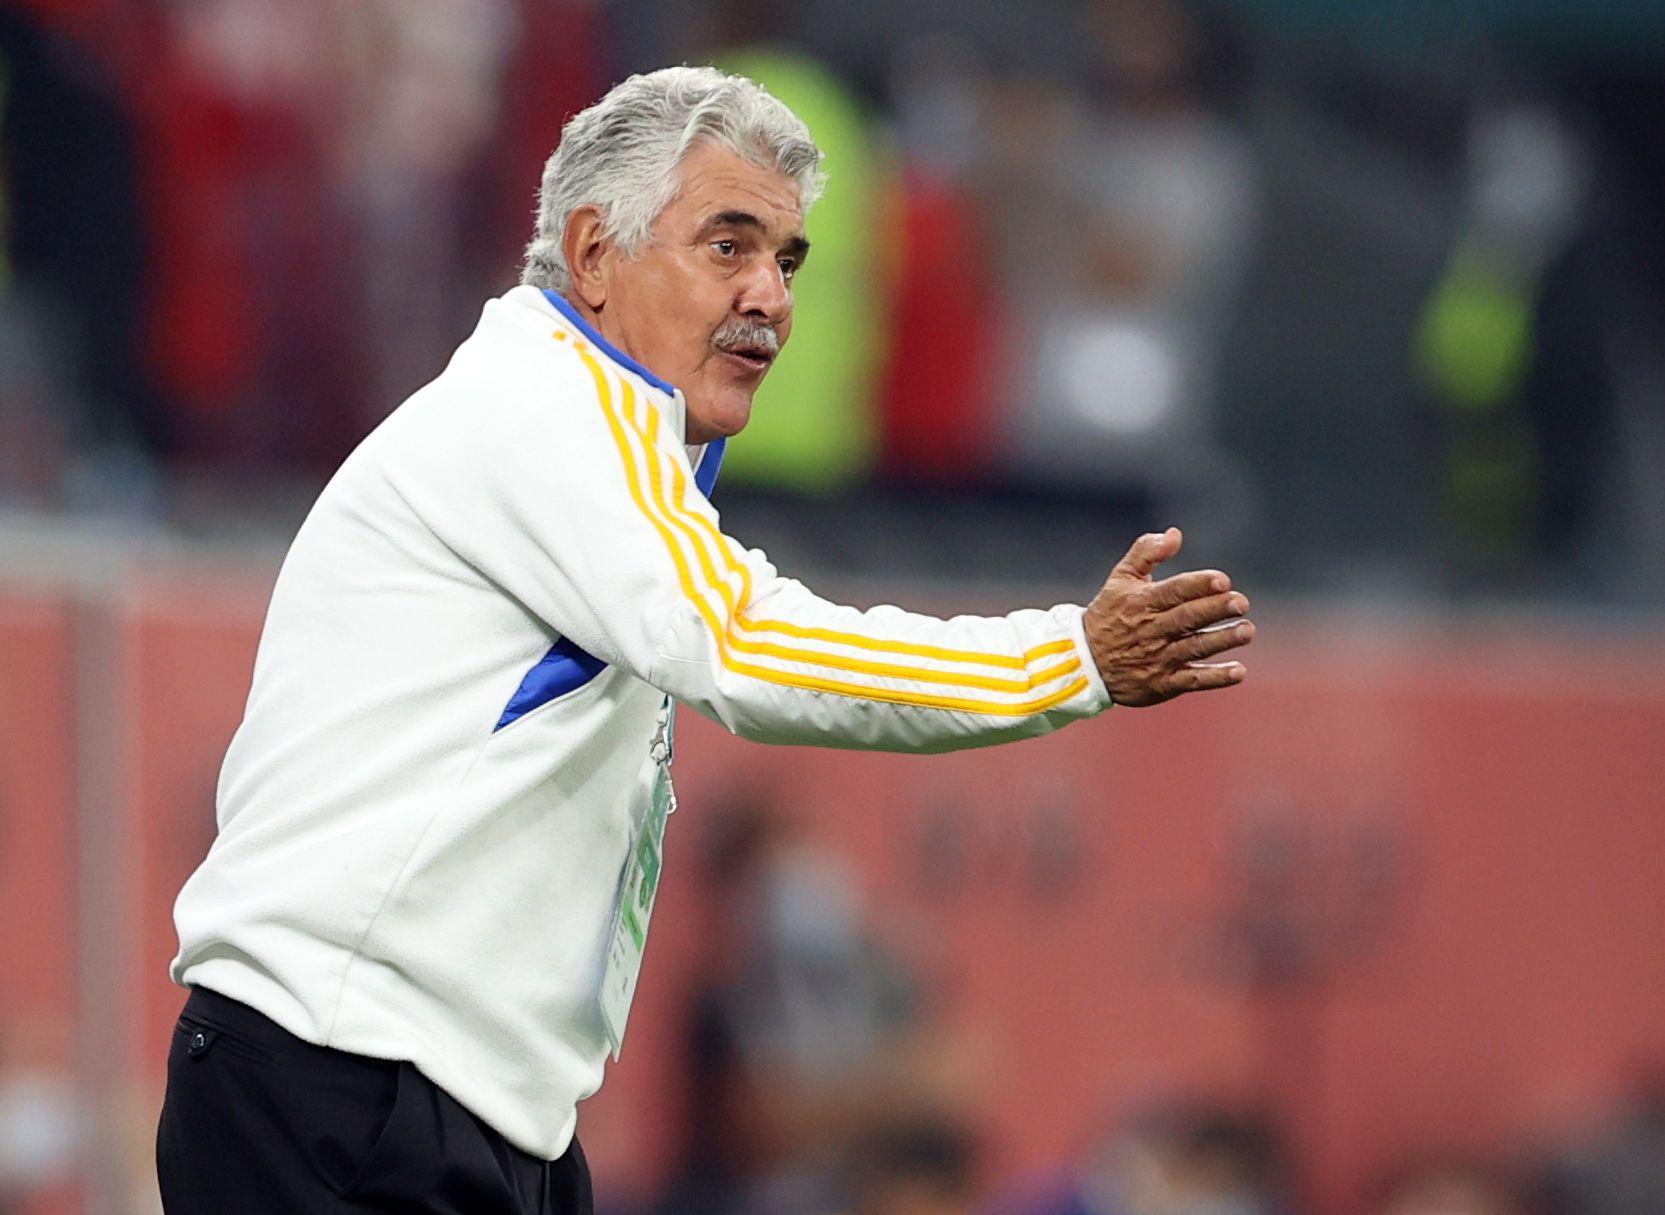 Ricardo Ferretti remarcó el hecho de haber llegado a la final del Mundial de Clubes (Foto: Ibraheem Al Omari/ Reuters)